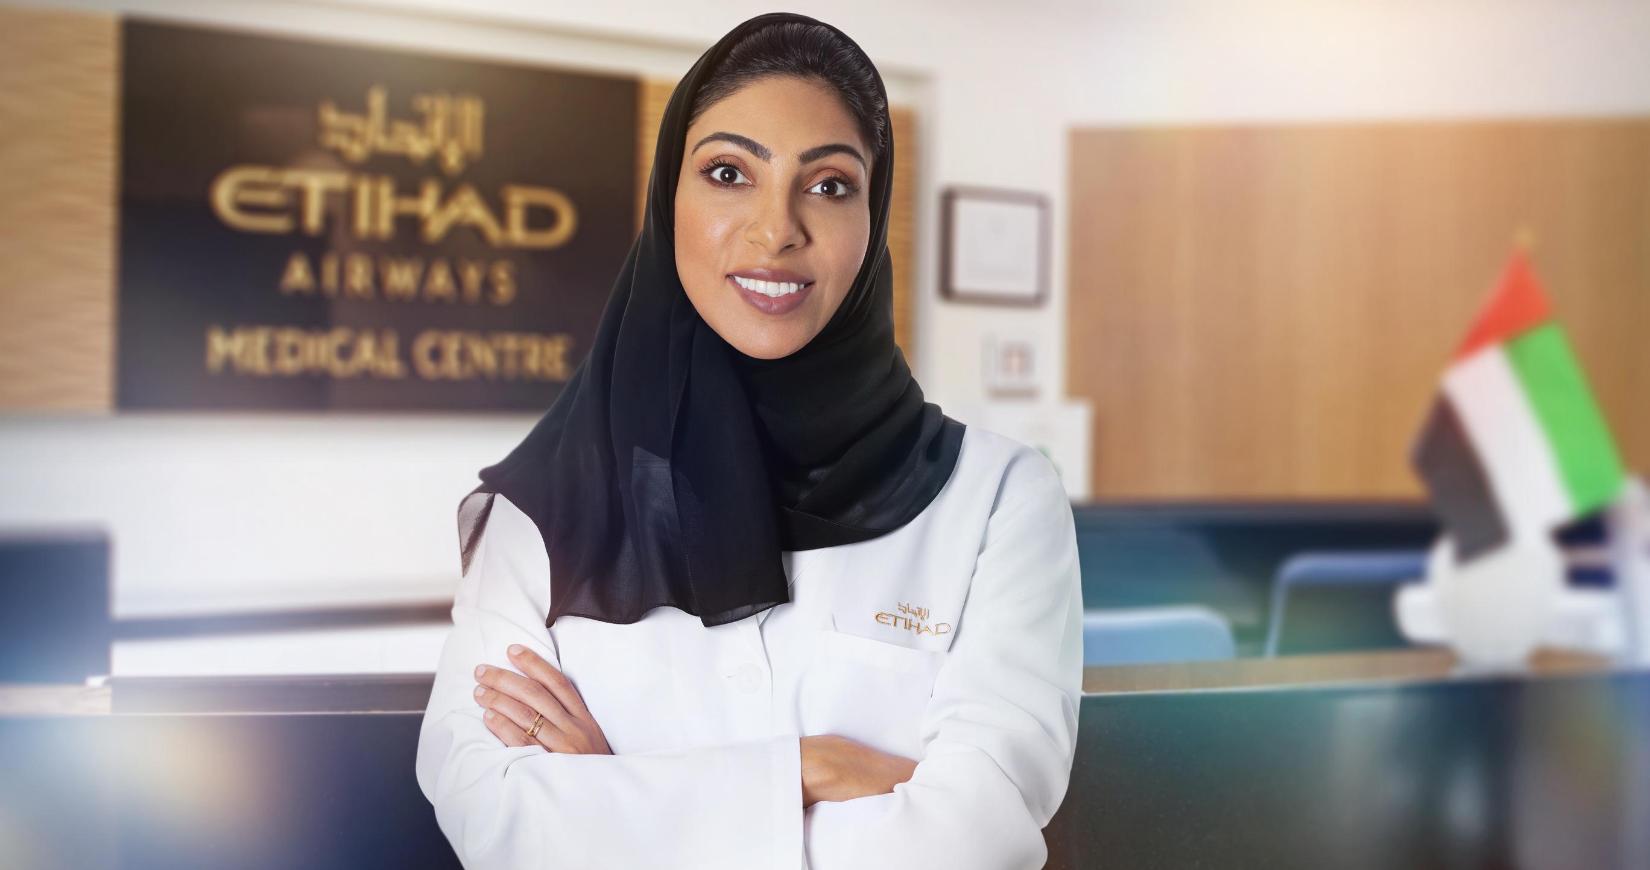 Emirati Women's Day 2020 Dr Nadia Bastaki Etihad